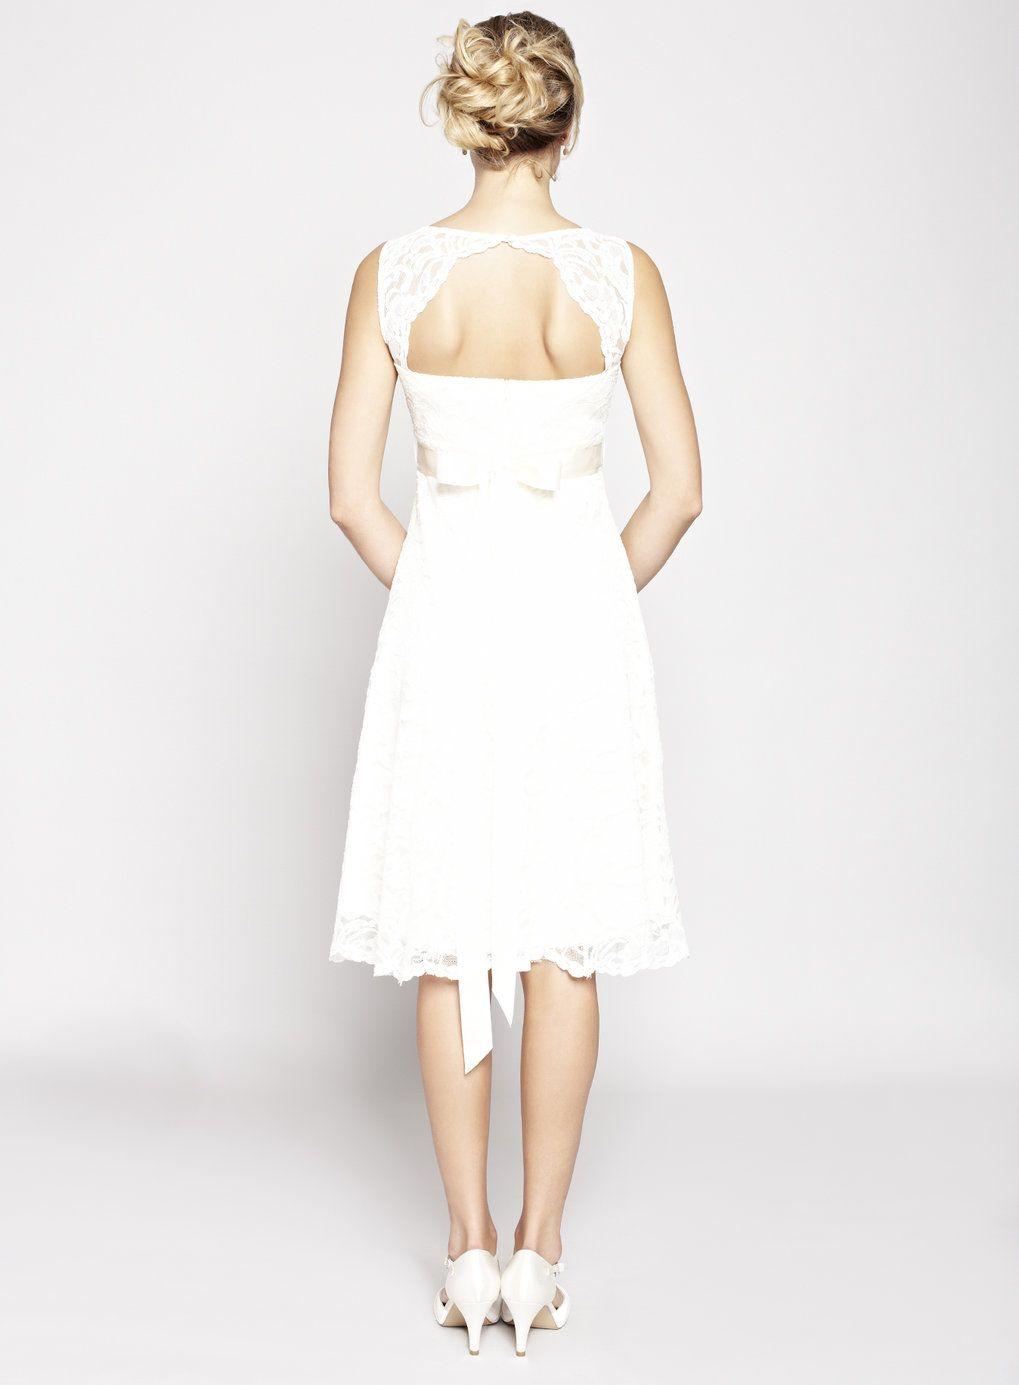 Ivory bella lace short bridal dress wedding bhs for Short ivory lace wedding dress